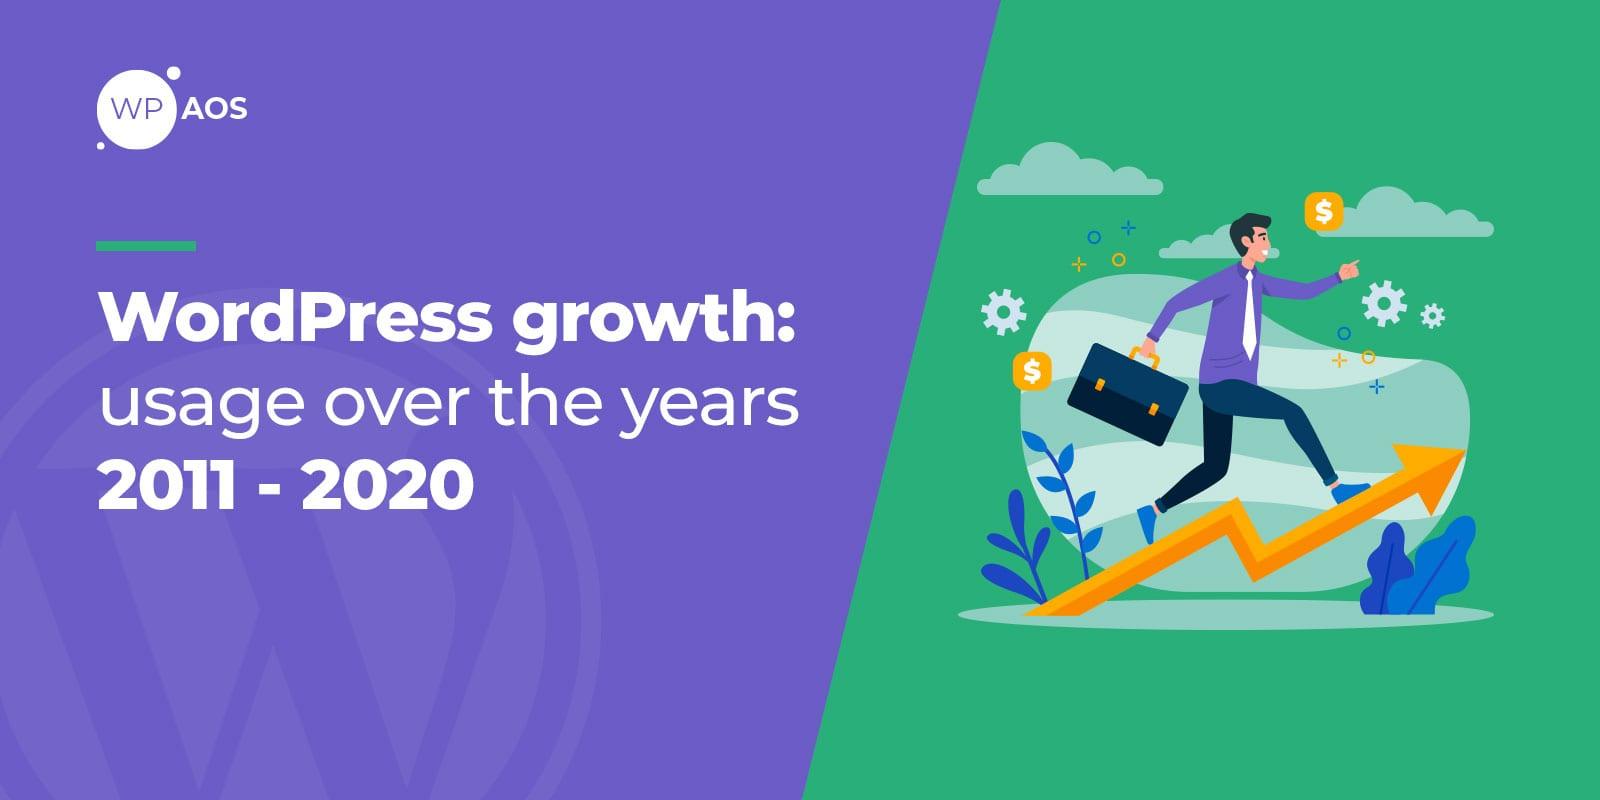 wordpress growth, build a website, wpaos